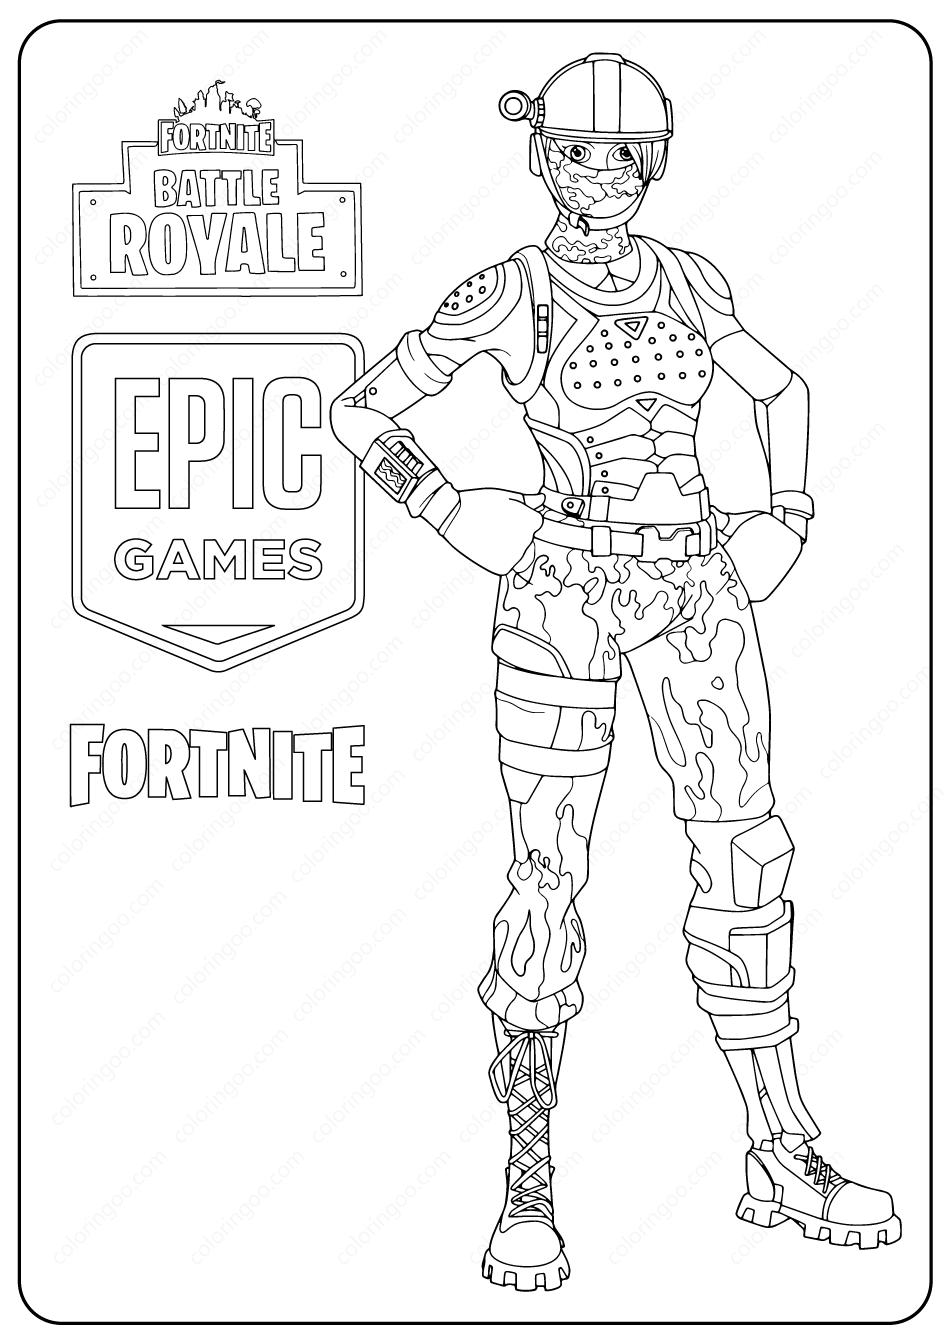 Printable Fortnite Elite Agent Skin Coloring Pages Coloring Pages Fortnite Free Printable Coloring